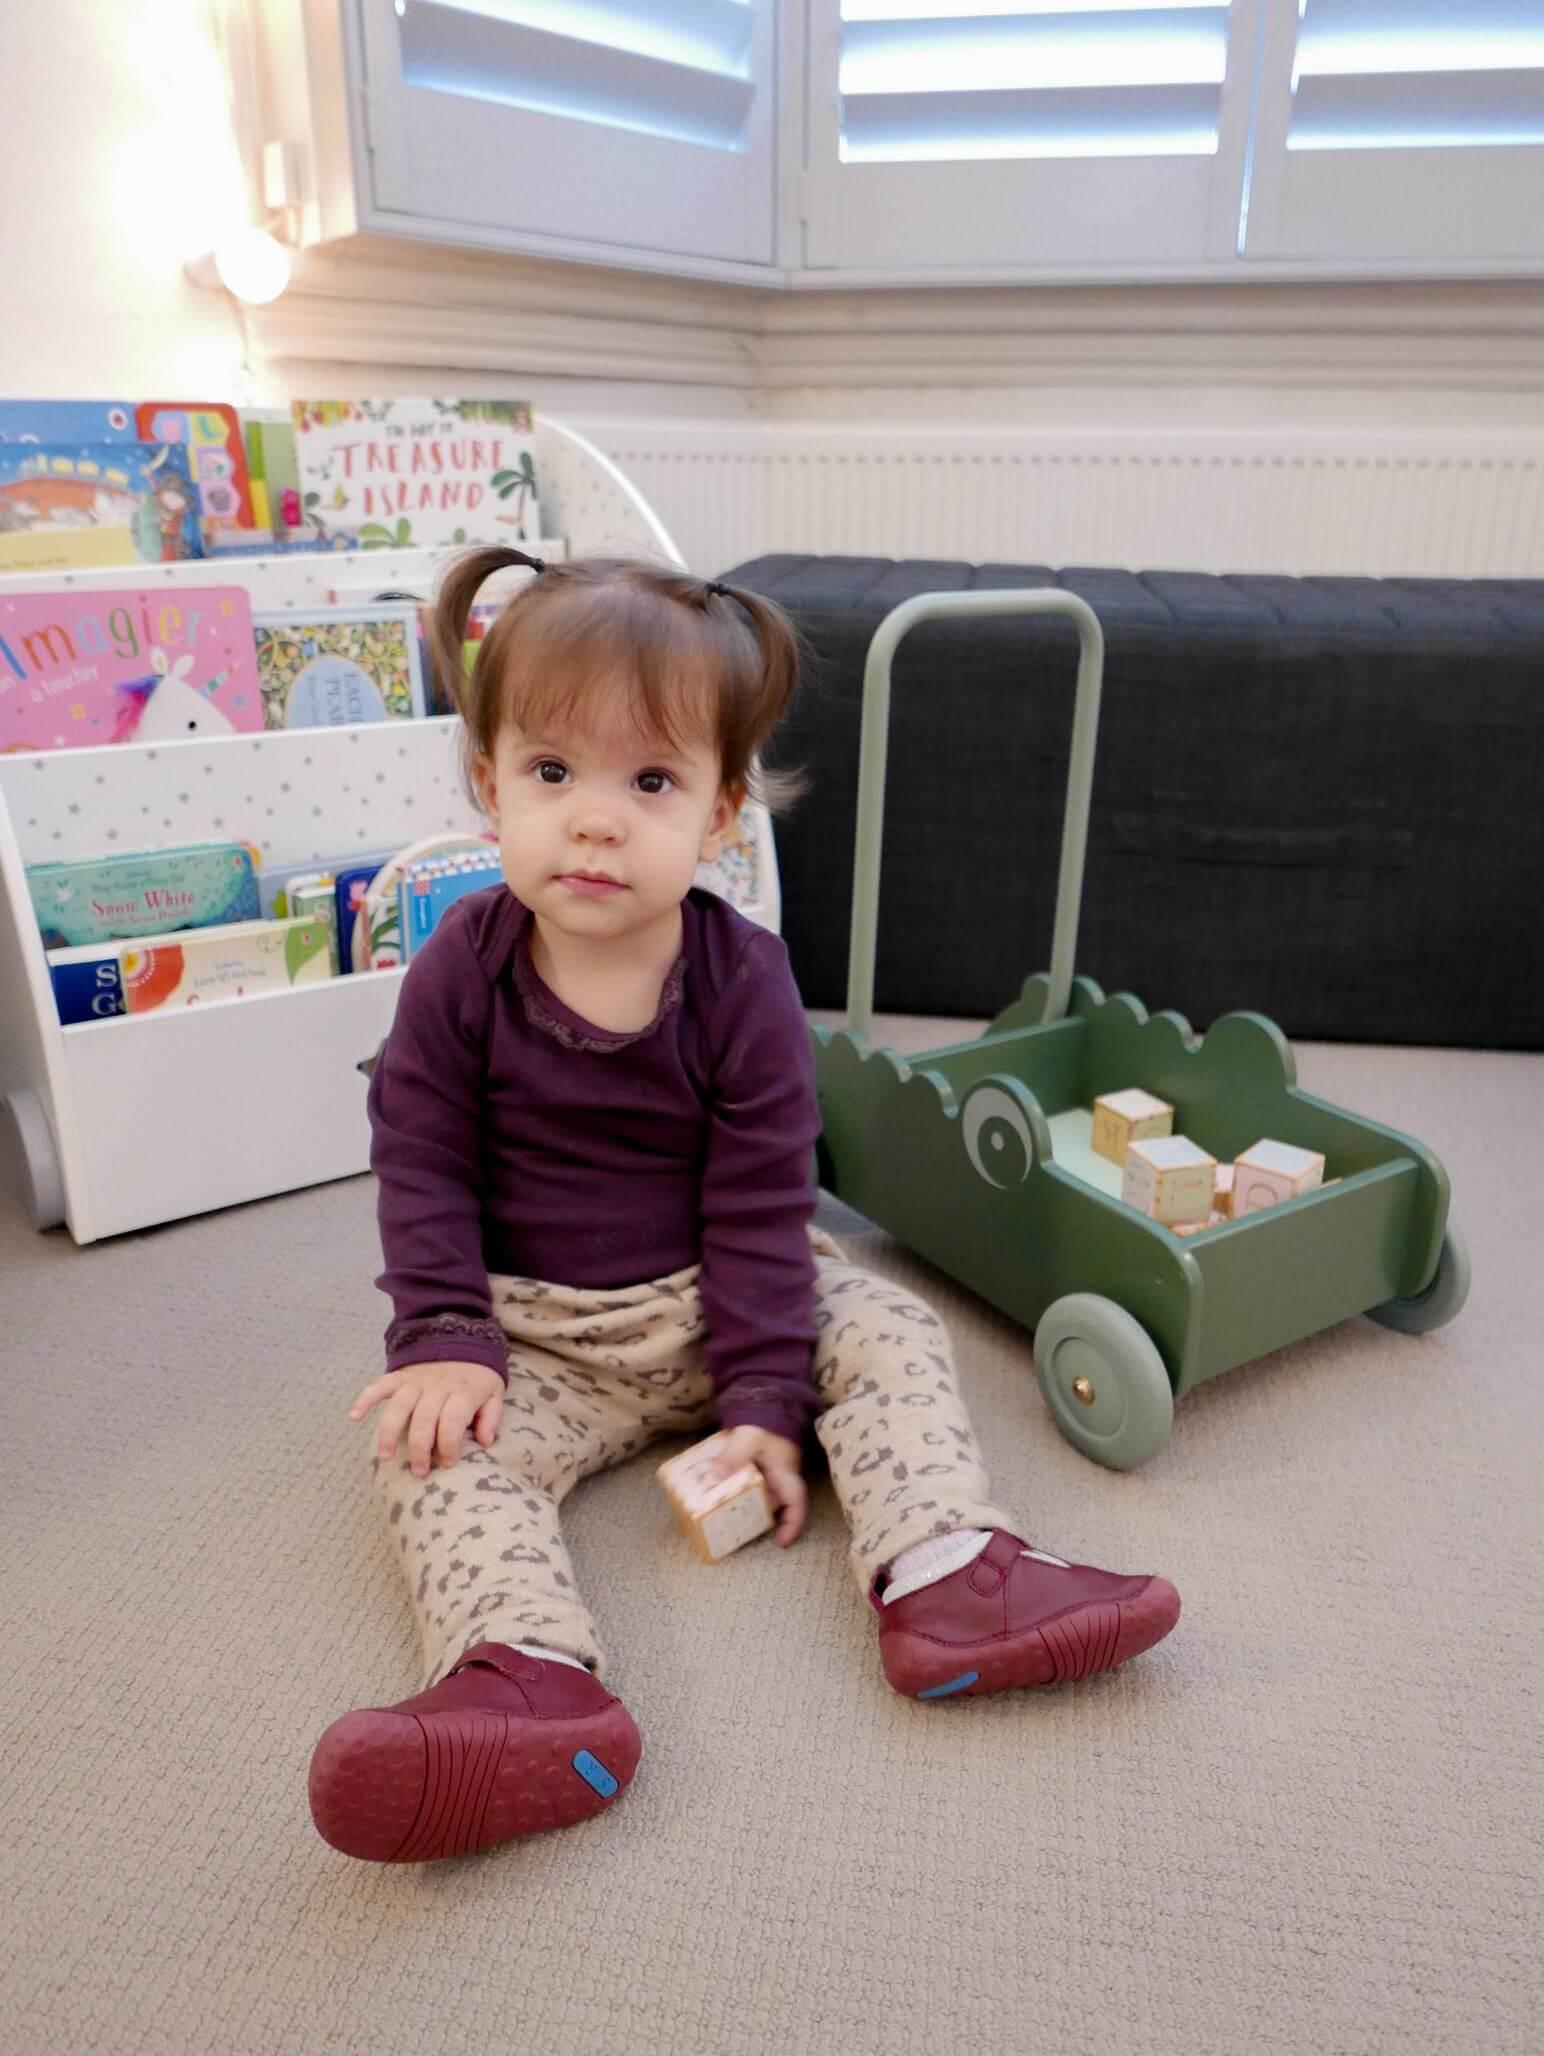 Clara wearing baby shoes